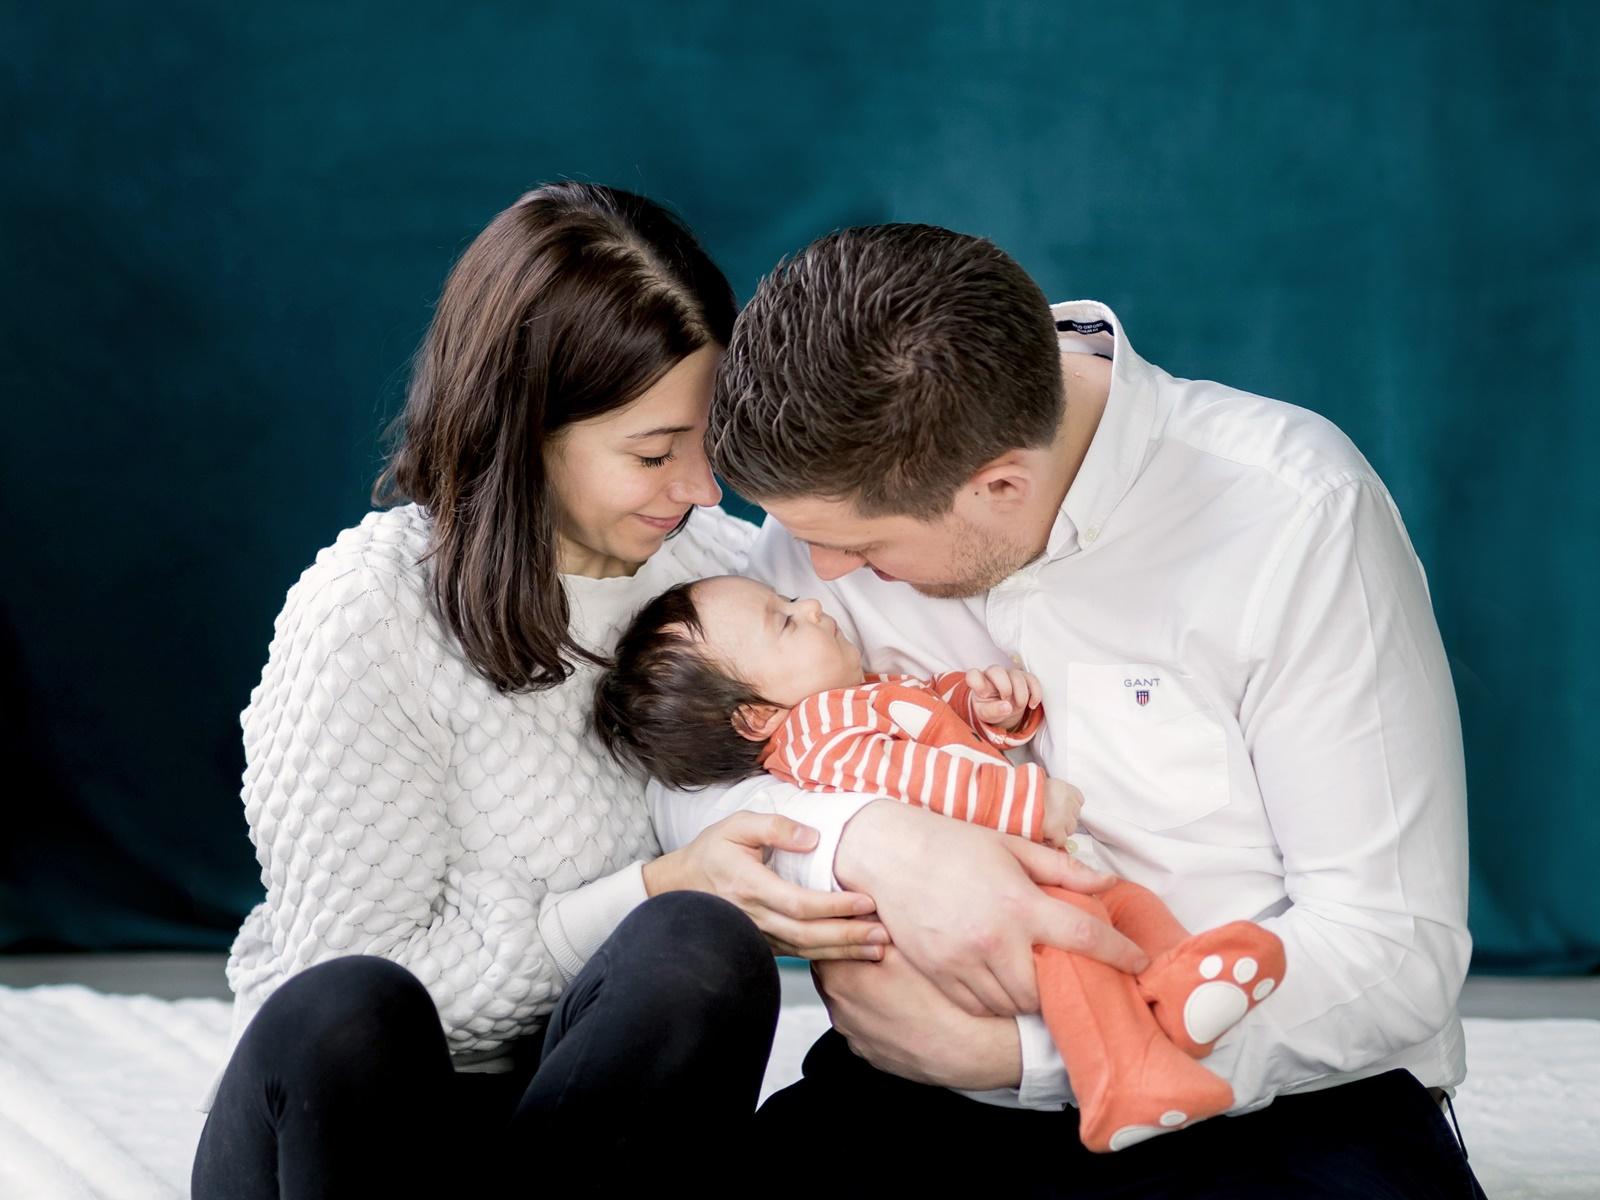 mii belle photo miibellephoto.se fotograf familj  gravid new born skene kinna borås göteborg kungsbacka  head 16 9 Fröken Foto foto studio 1 (9) 2.jpg